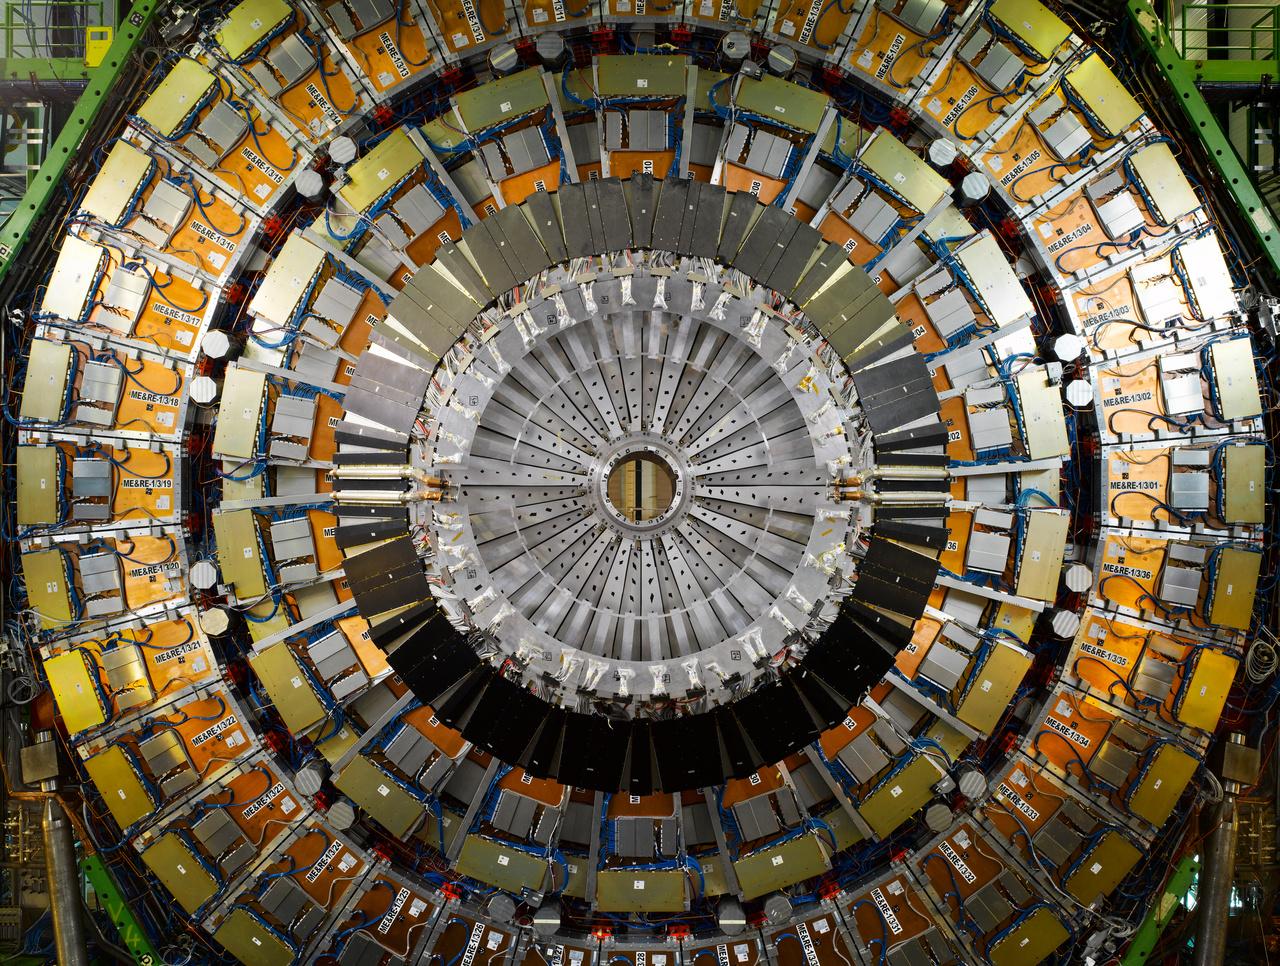 hadronutkozeto.jpg